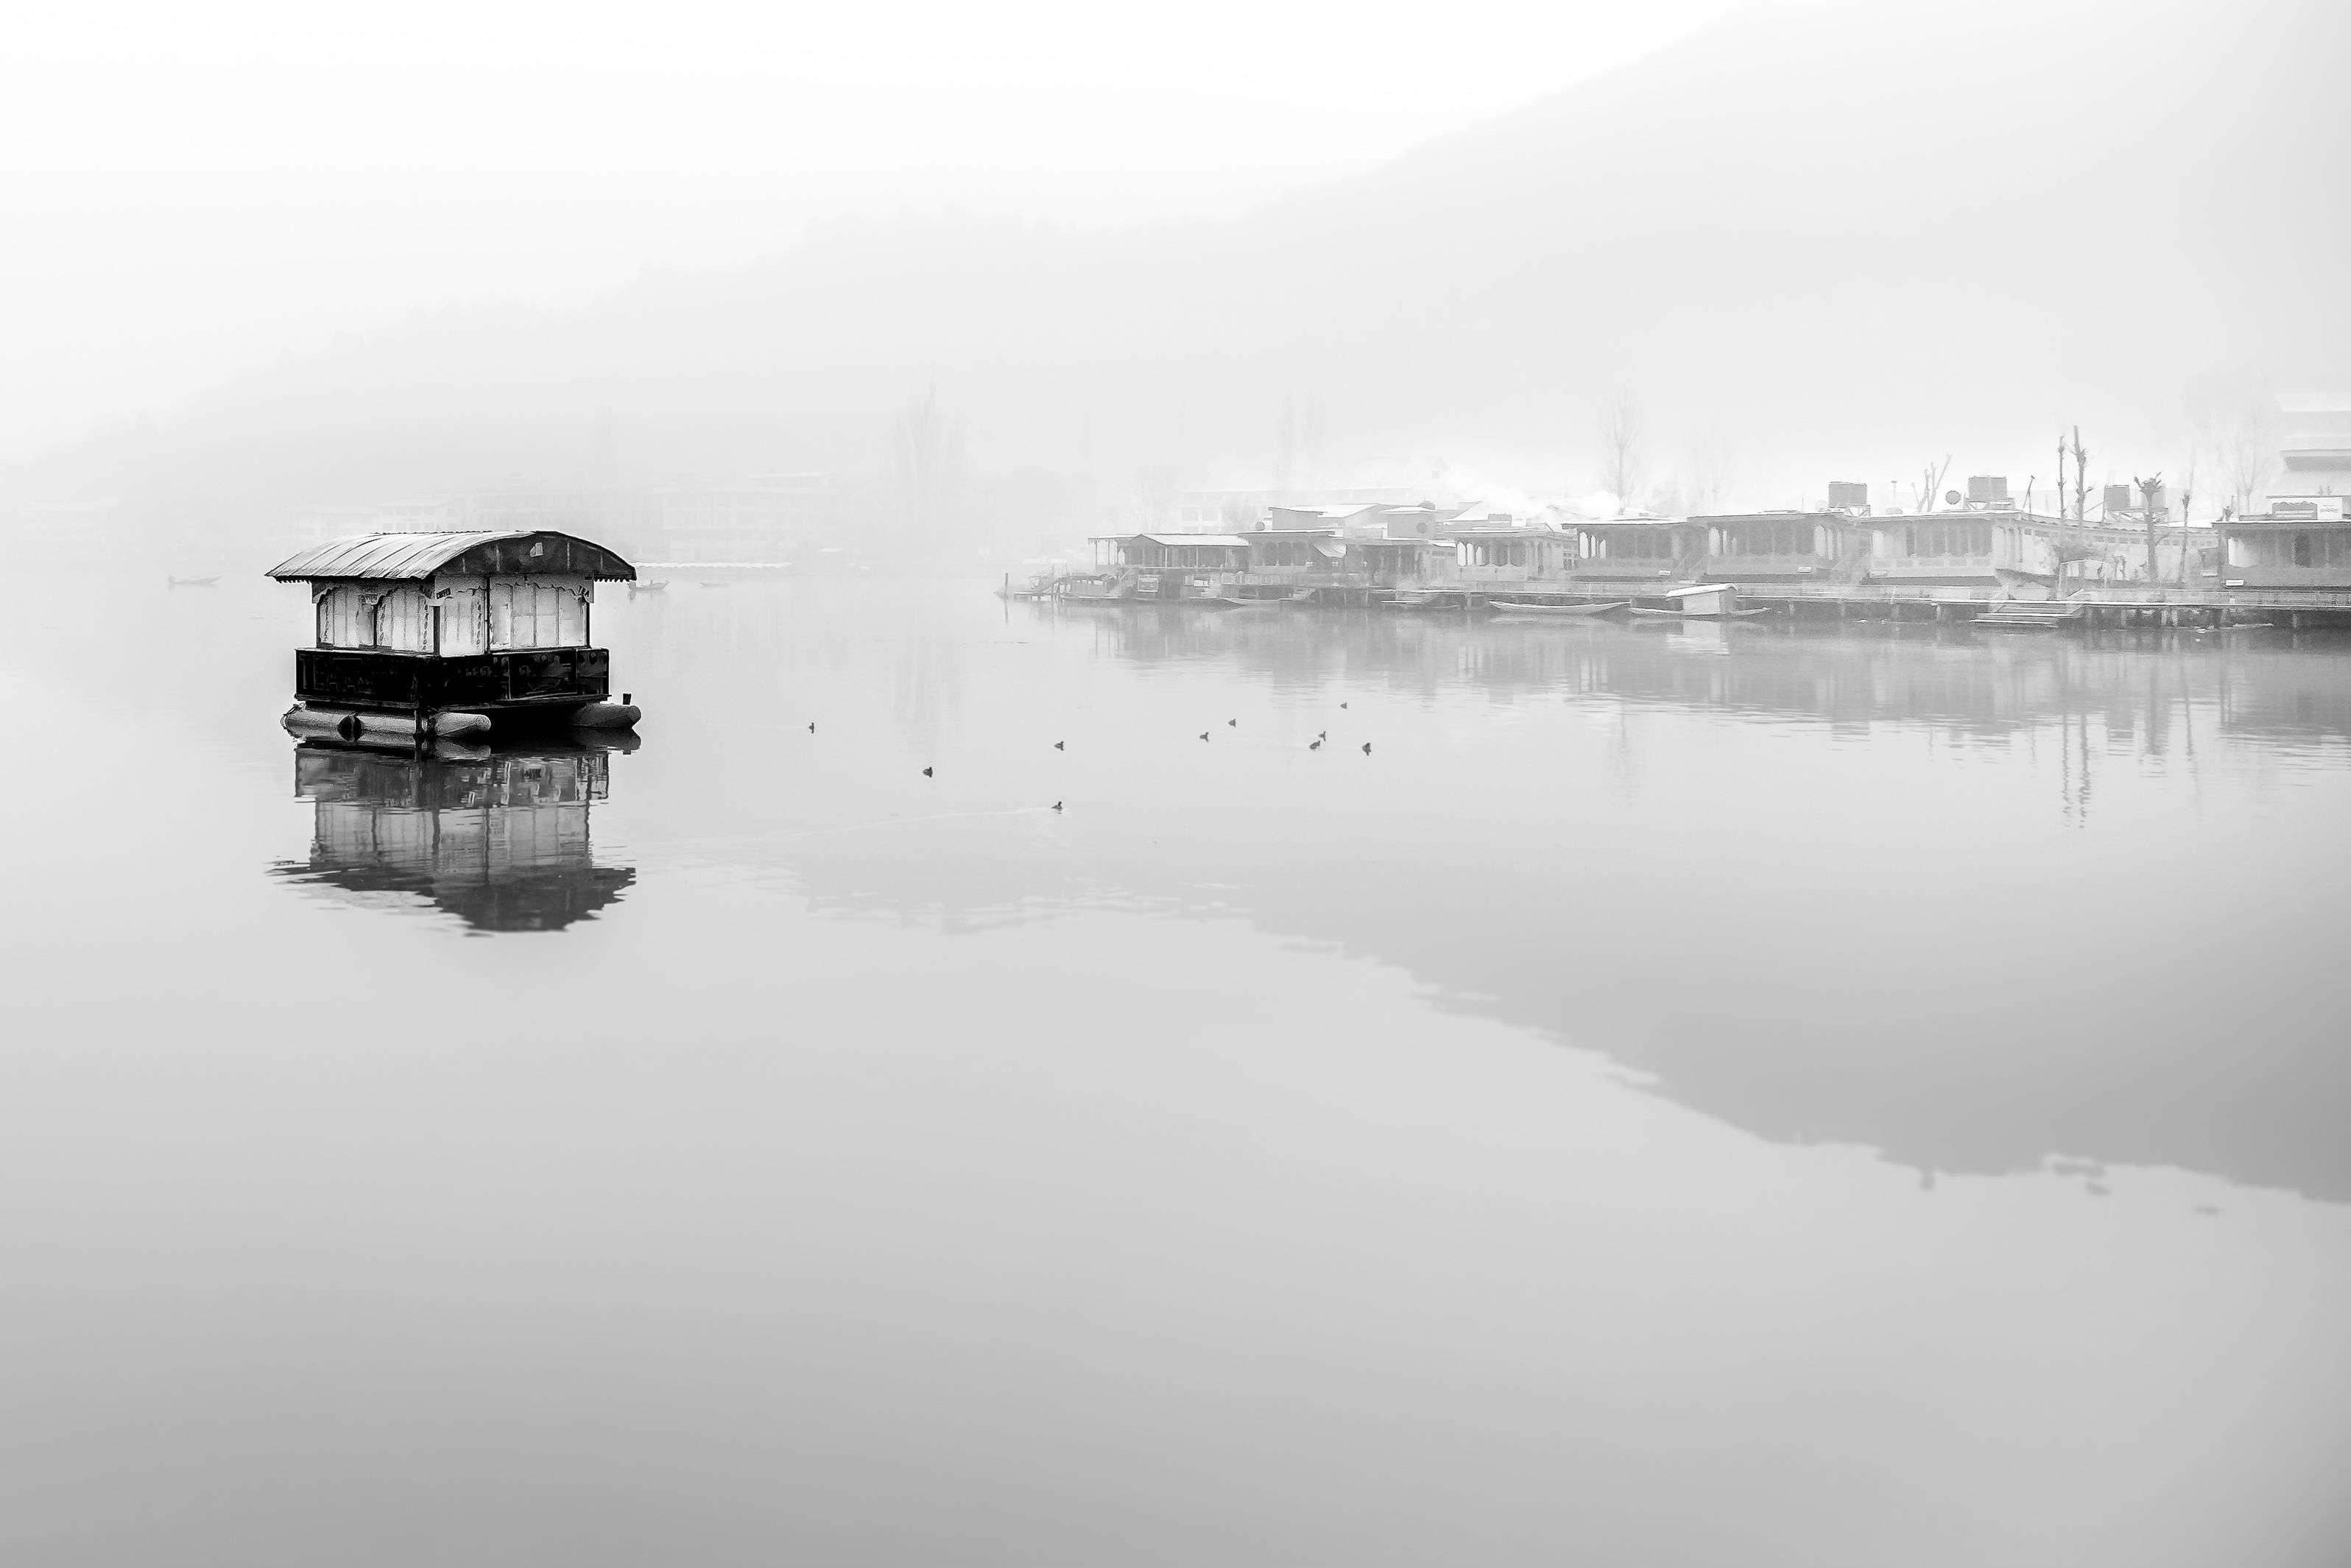 Dal Lake freezes partially; Uttarakhand to see light rain and snow